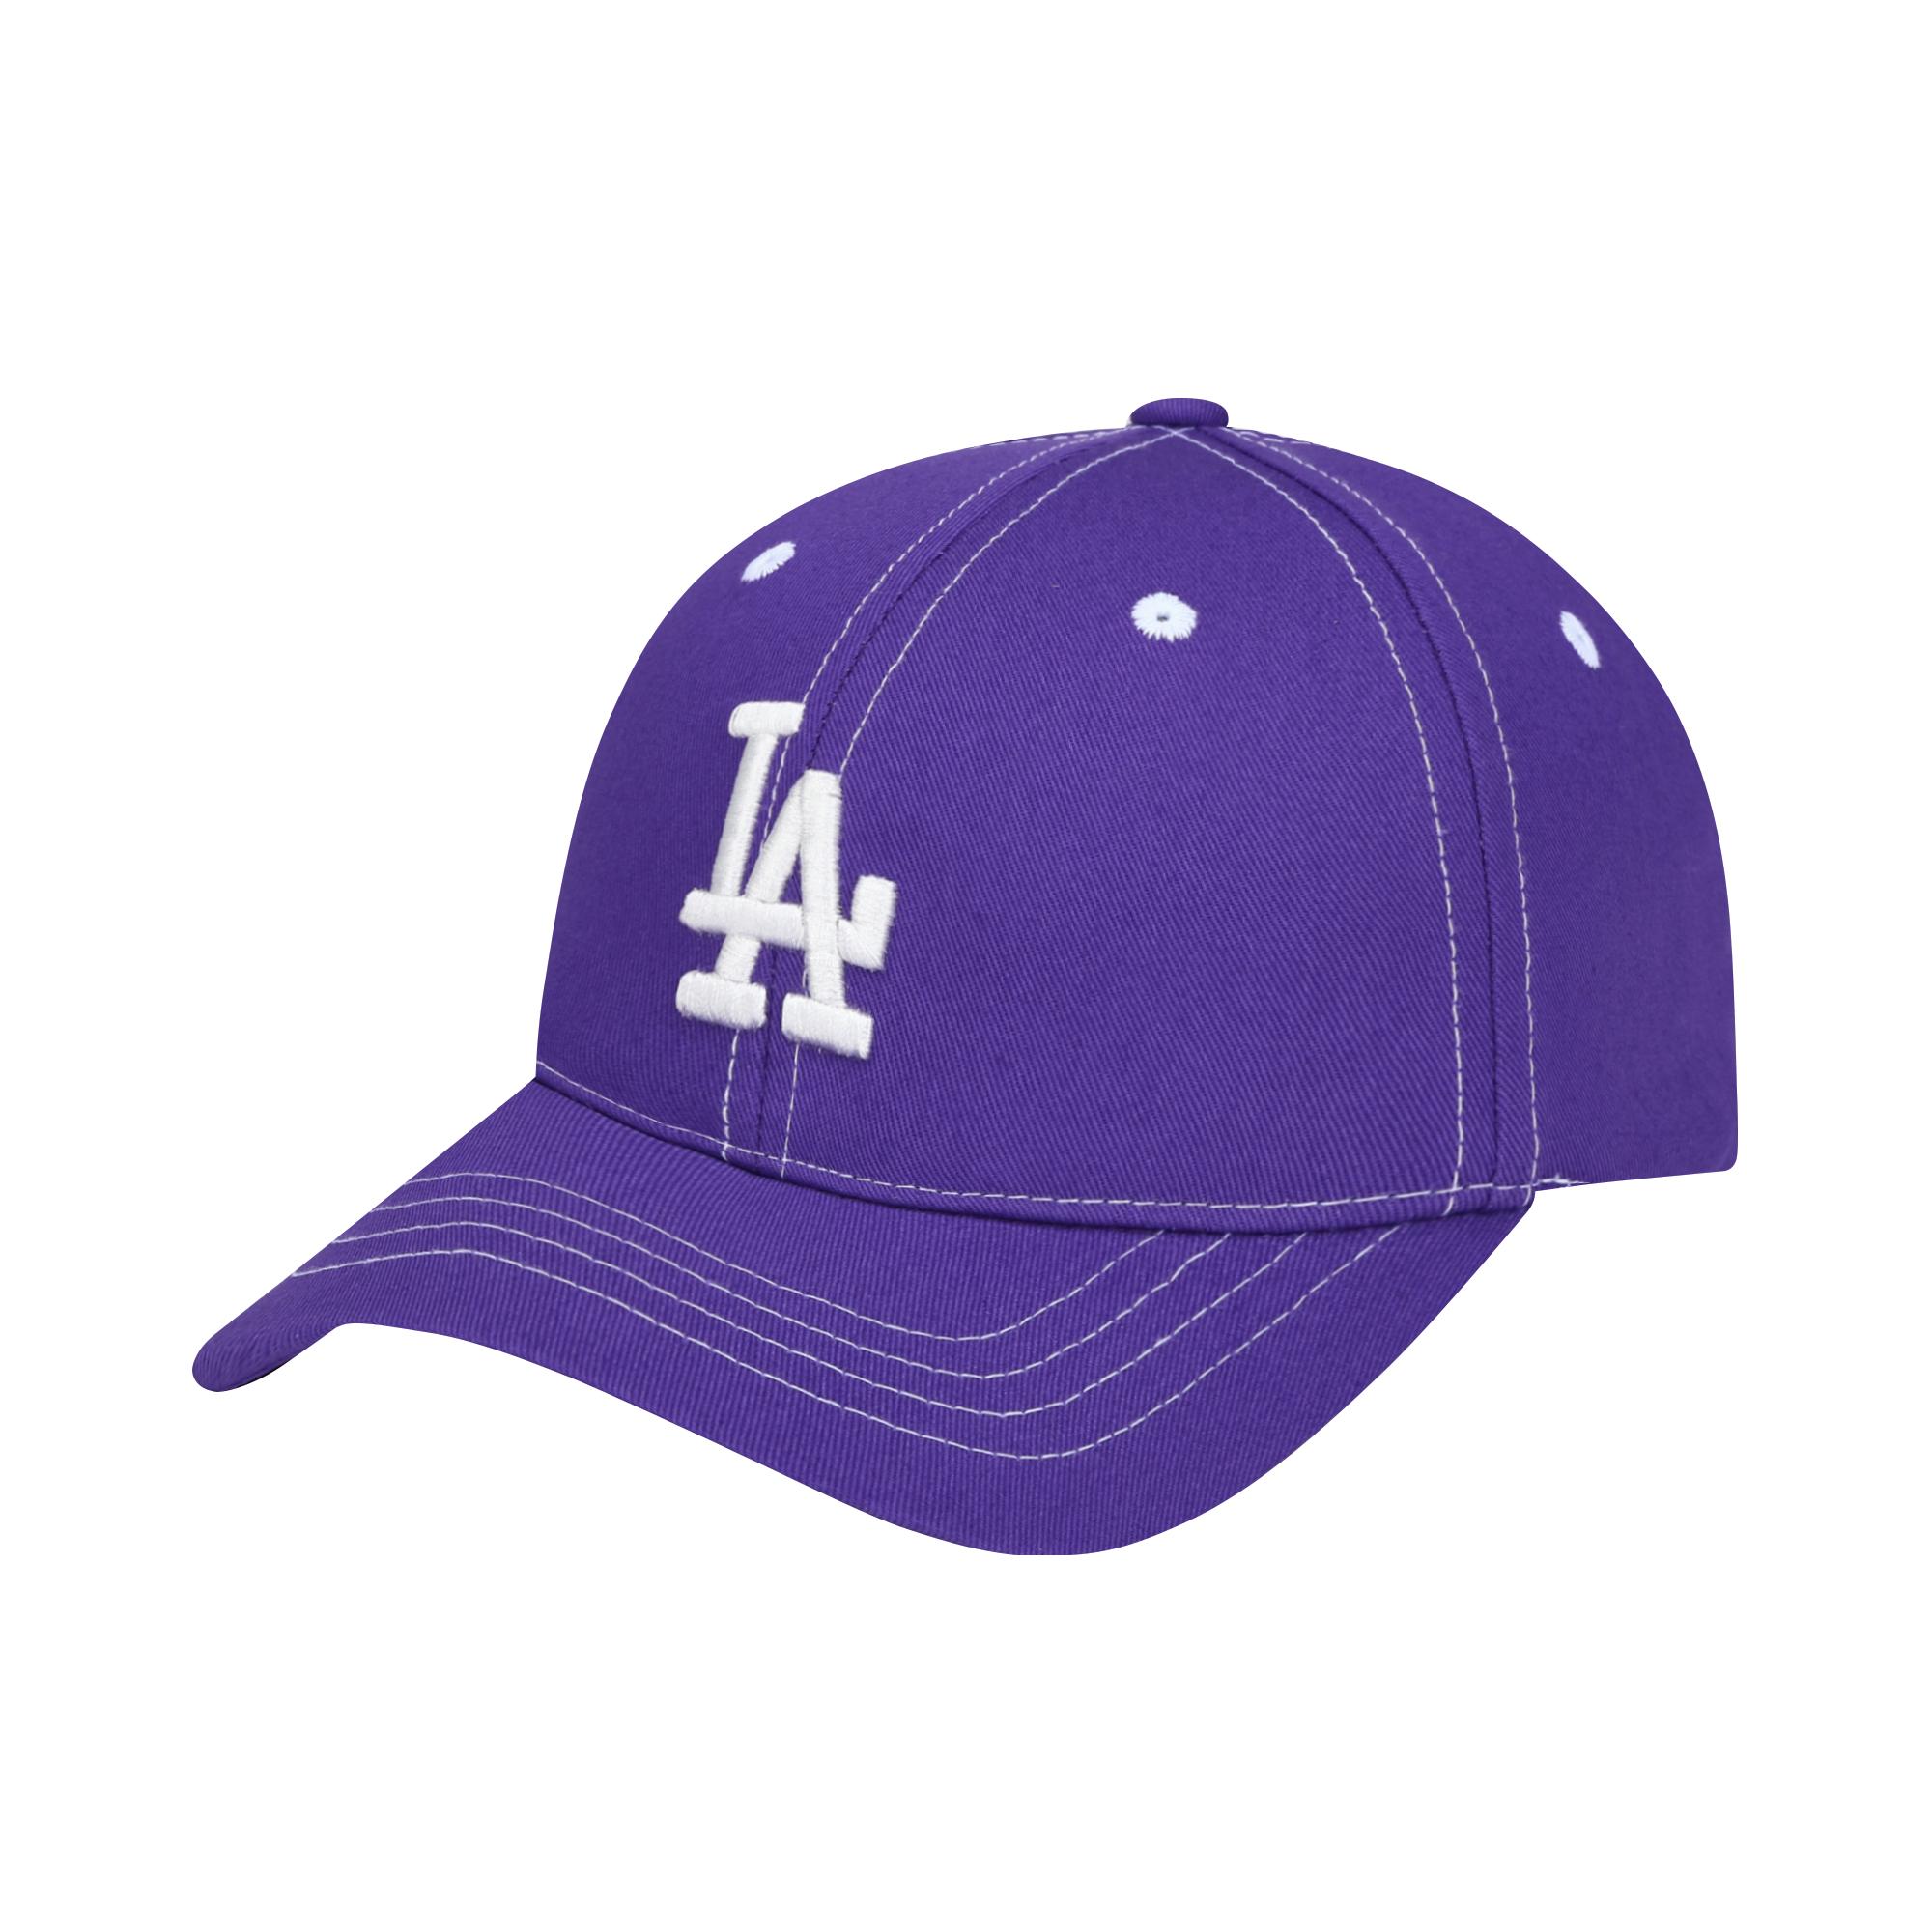 LA DODGERS STITCH POINT BALL CAP